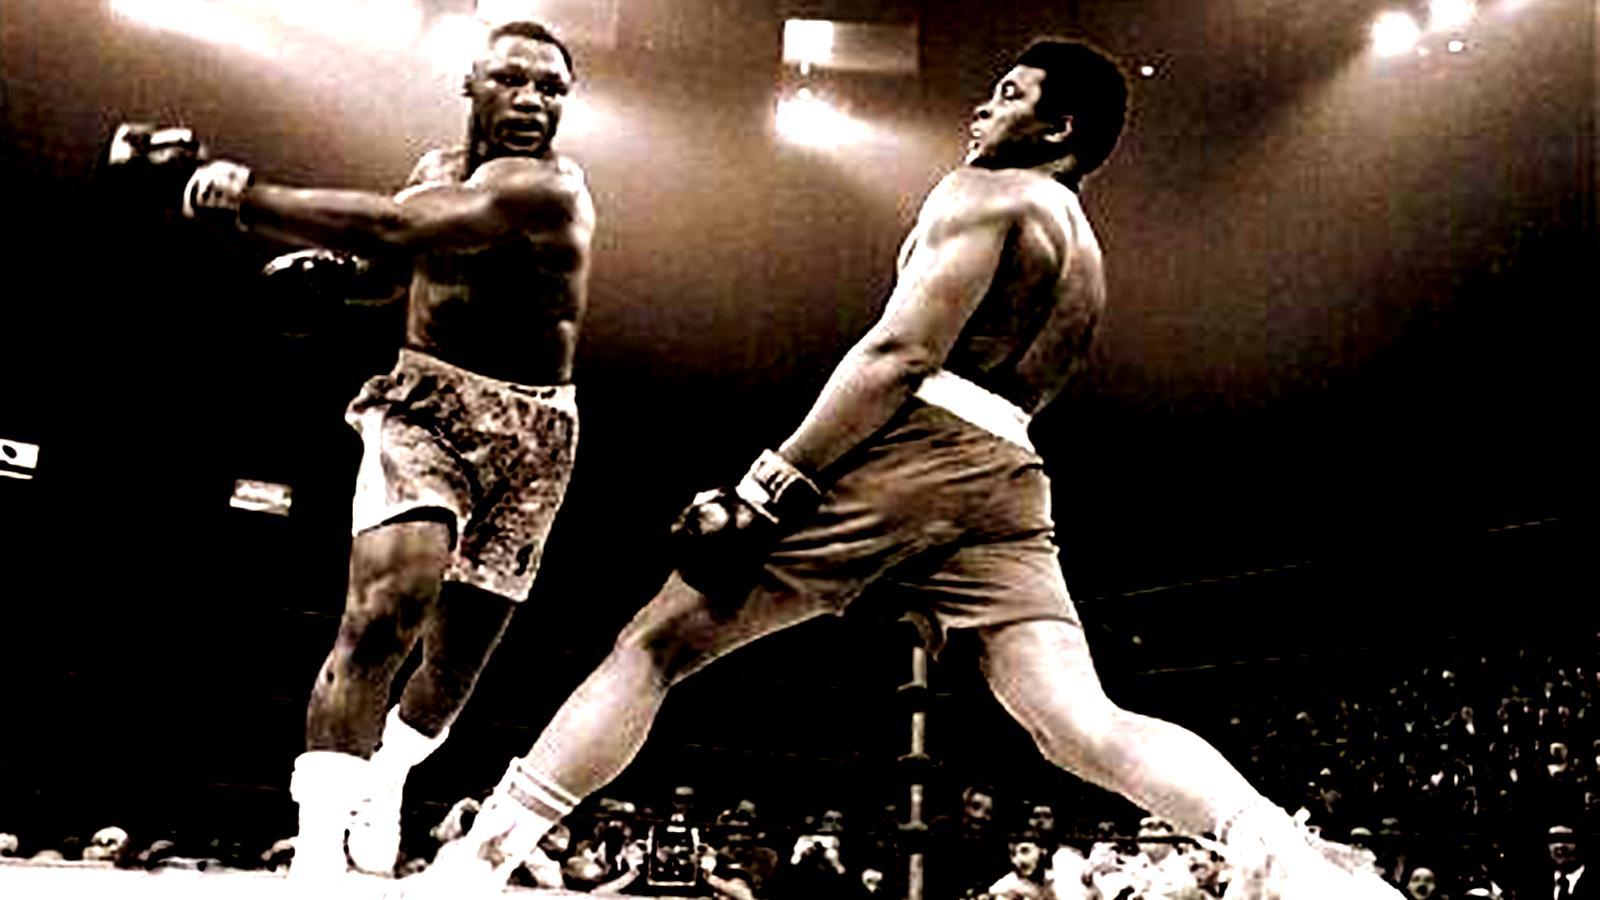 HD Muhammad Ali Wallpaper - WallpaperSafari